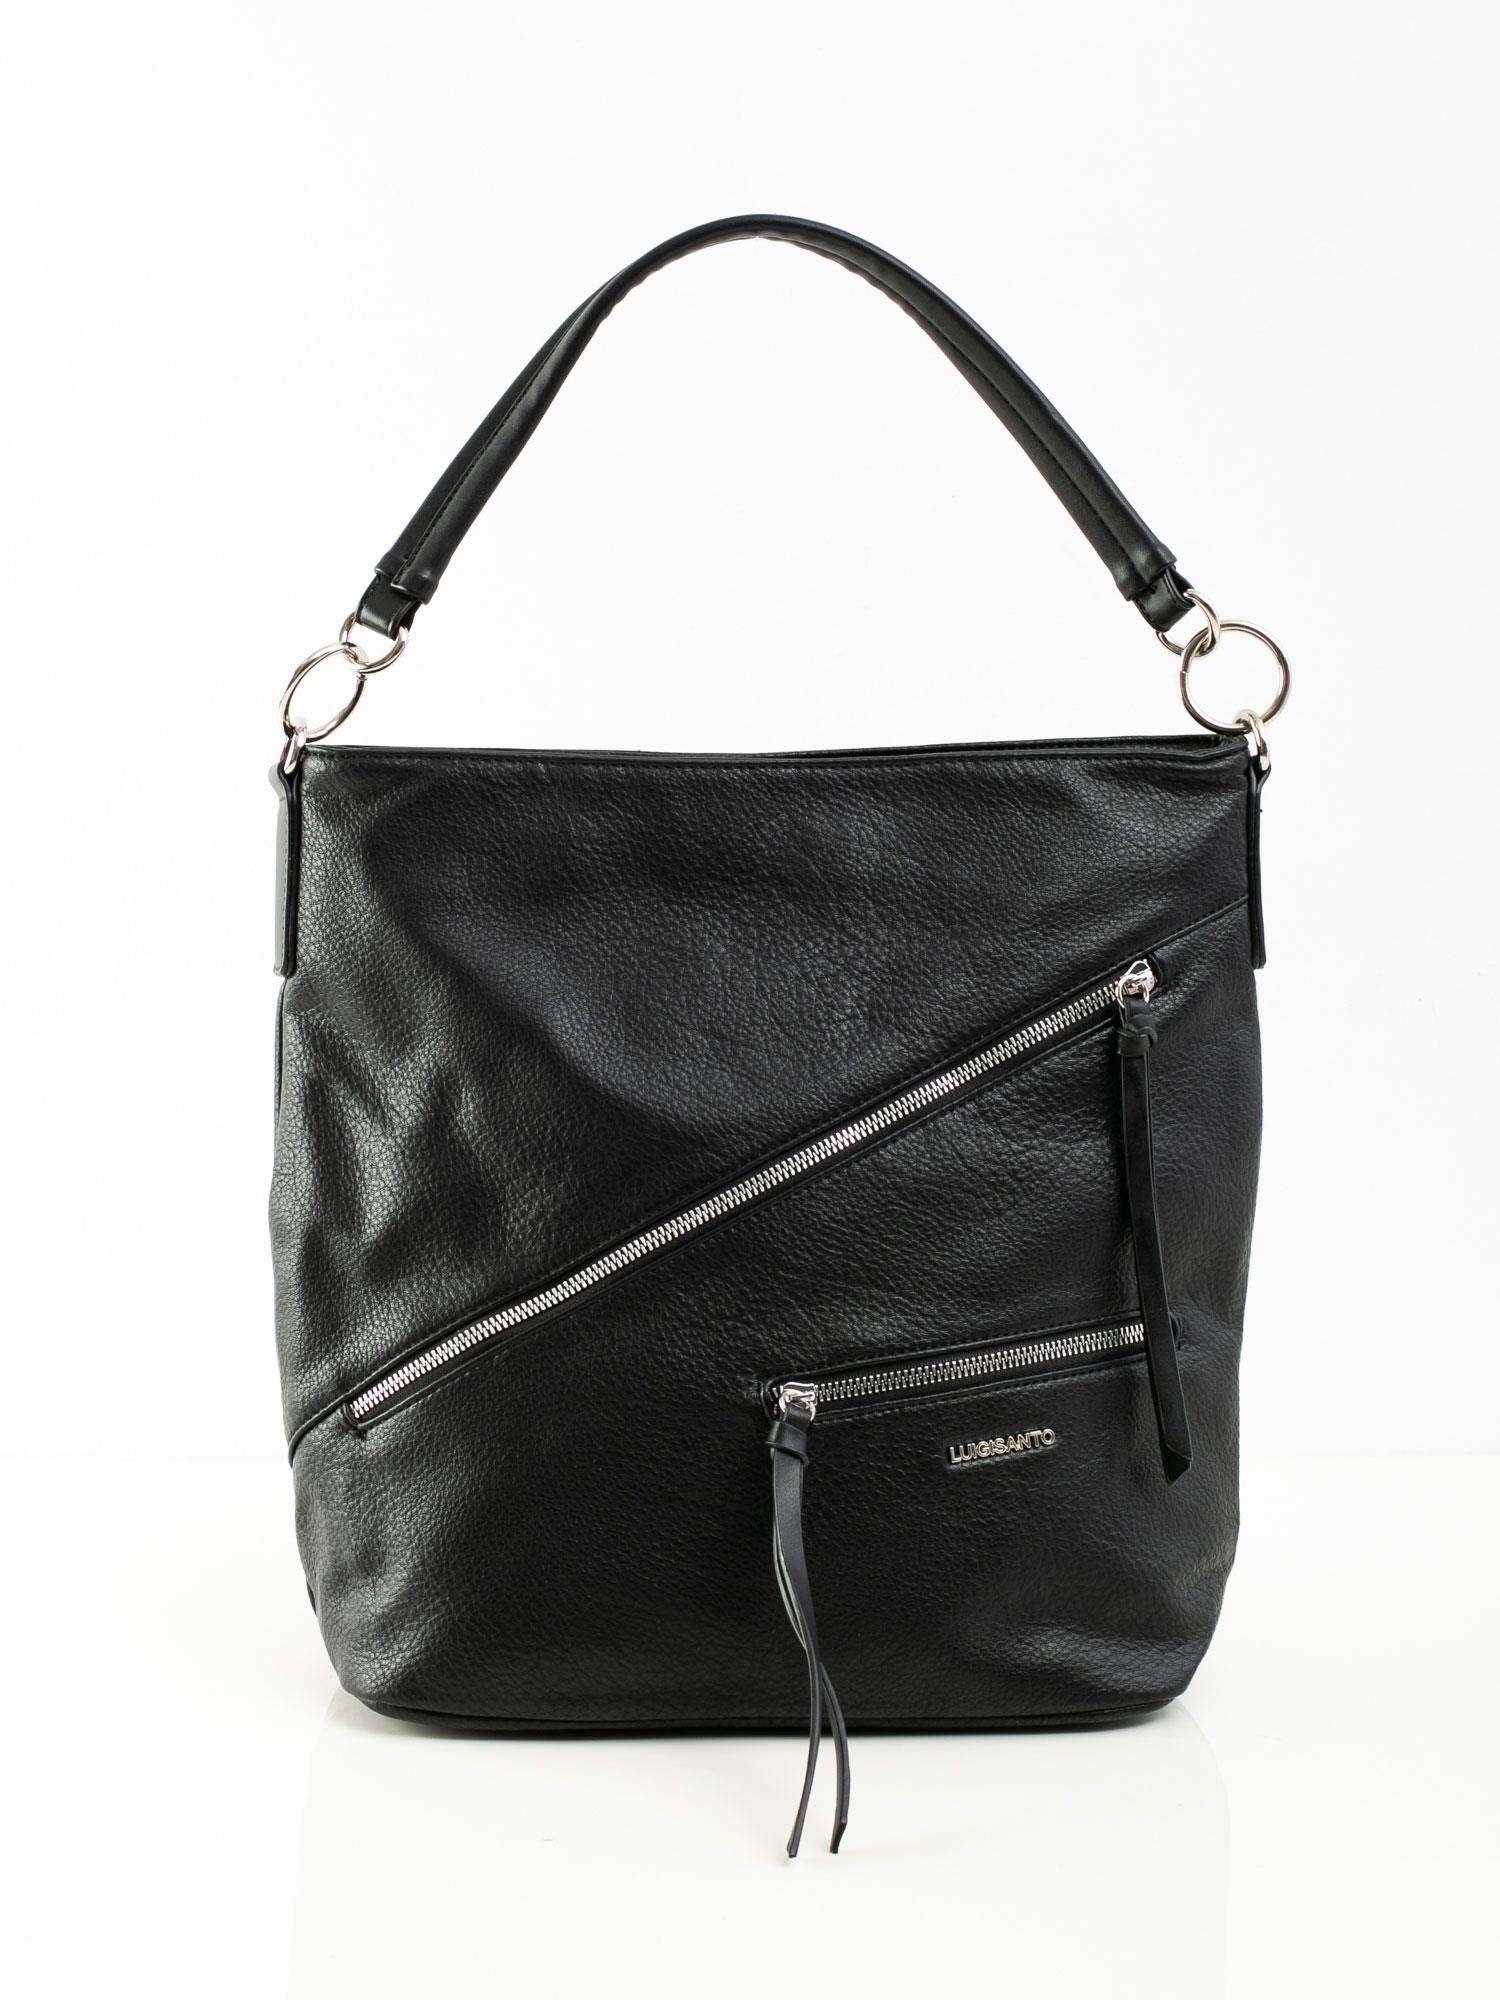 Dámska čierna kabelka s vreckami - UNI